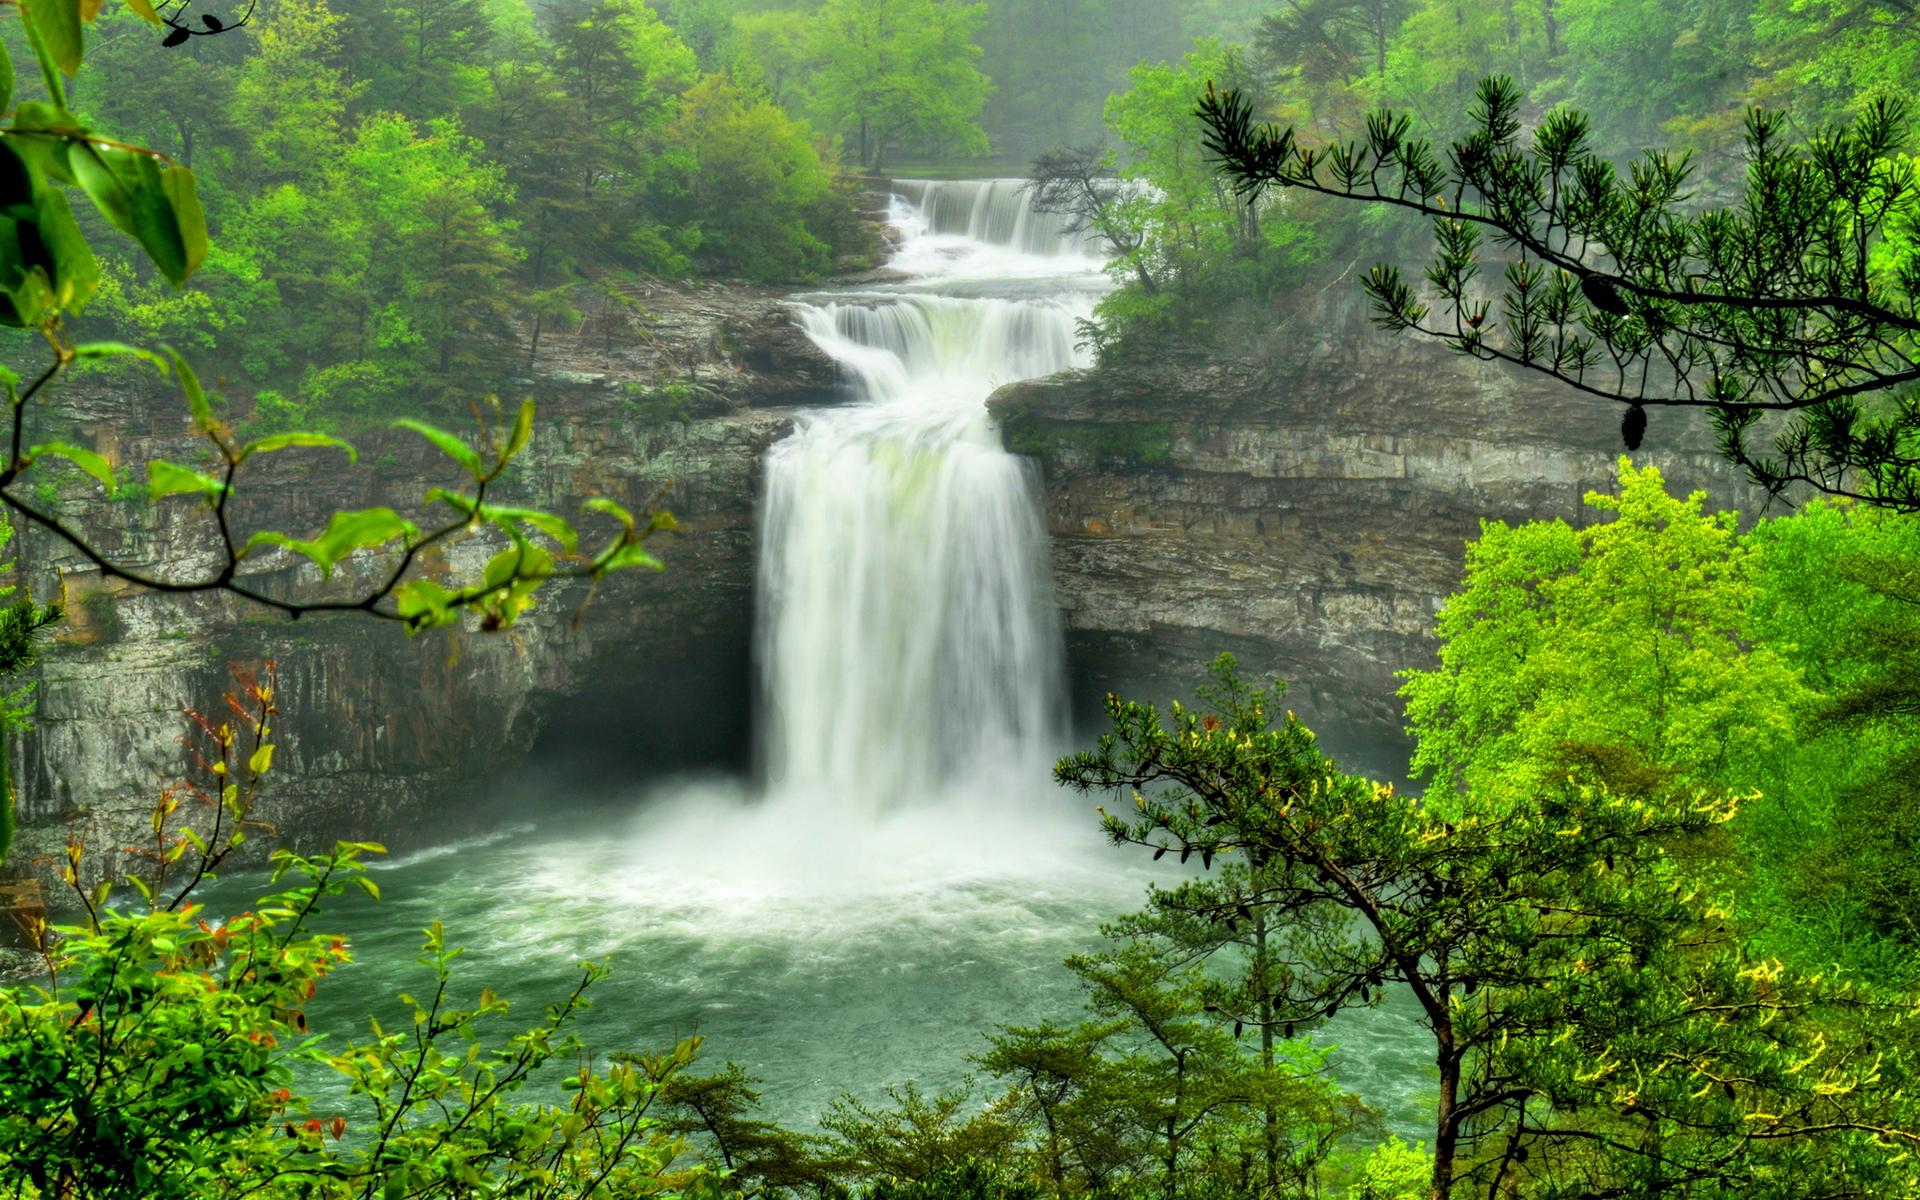 Waterfalls Live Wallpaper 3d Hd Waterfalls Wallpaper Desoto Hd Desktop Wallpapers 4k Hd